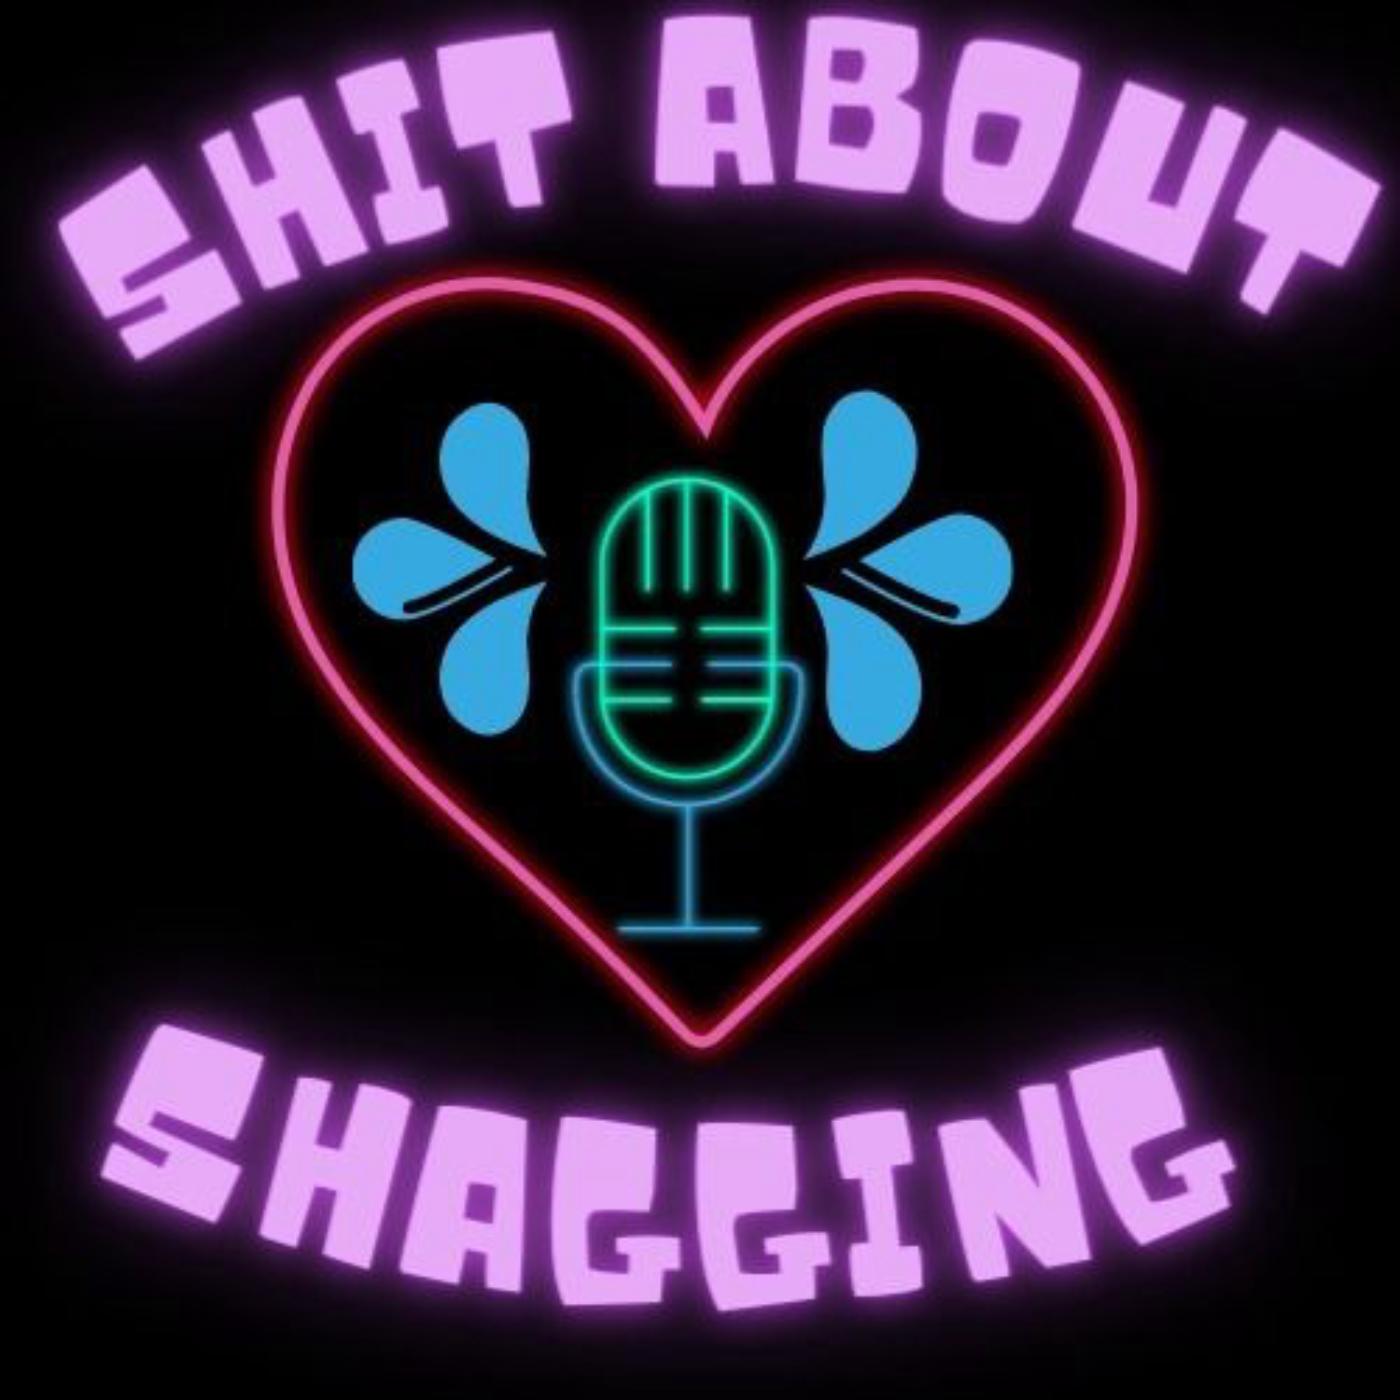 shitaboutshagging avatar